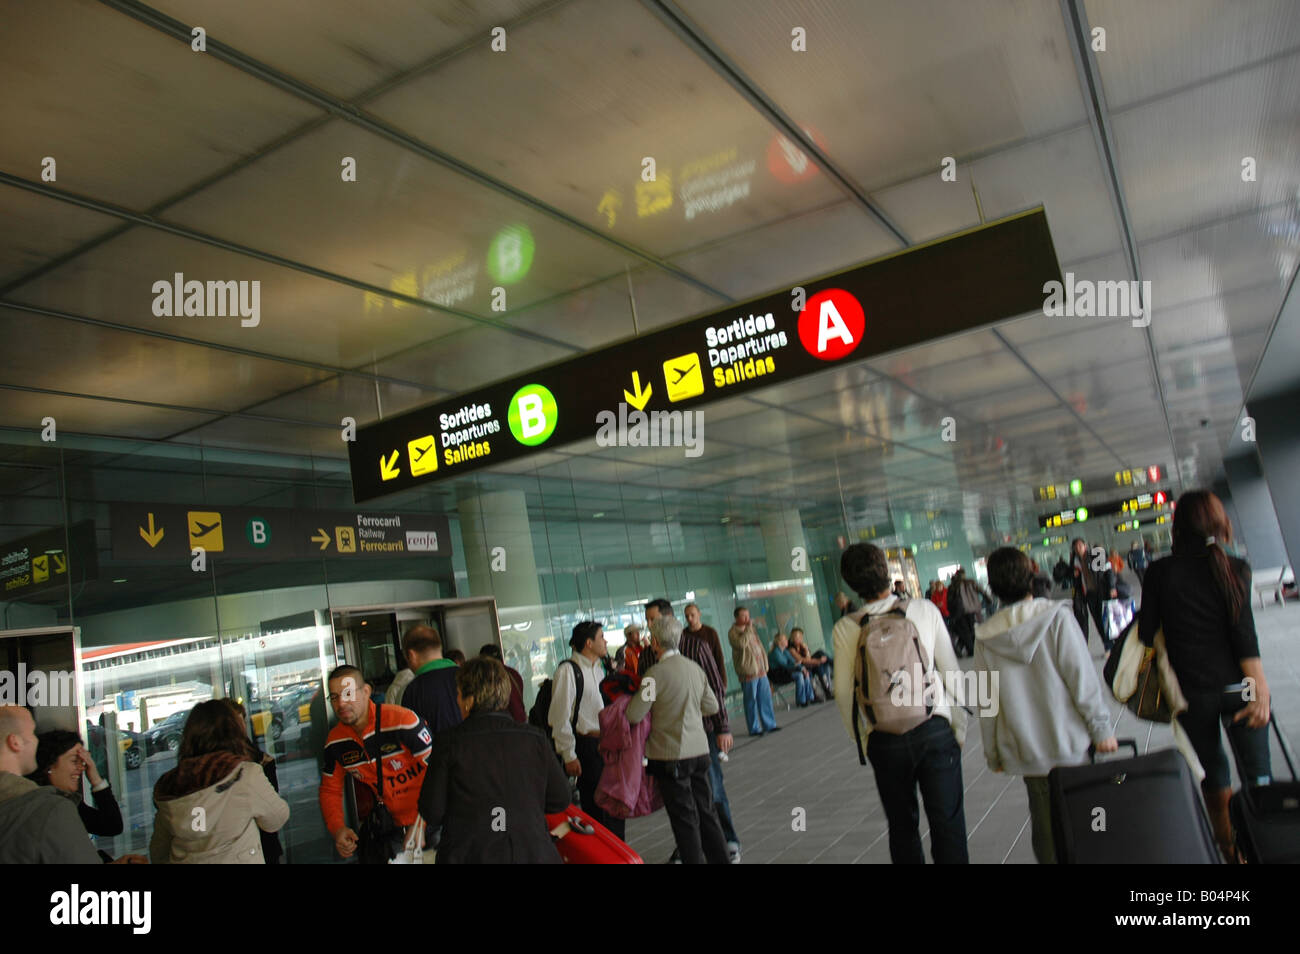 Flughafen airport aerodrome Reisen travel travelling traveling - Stock Image